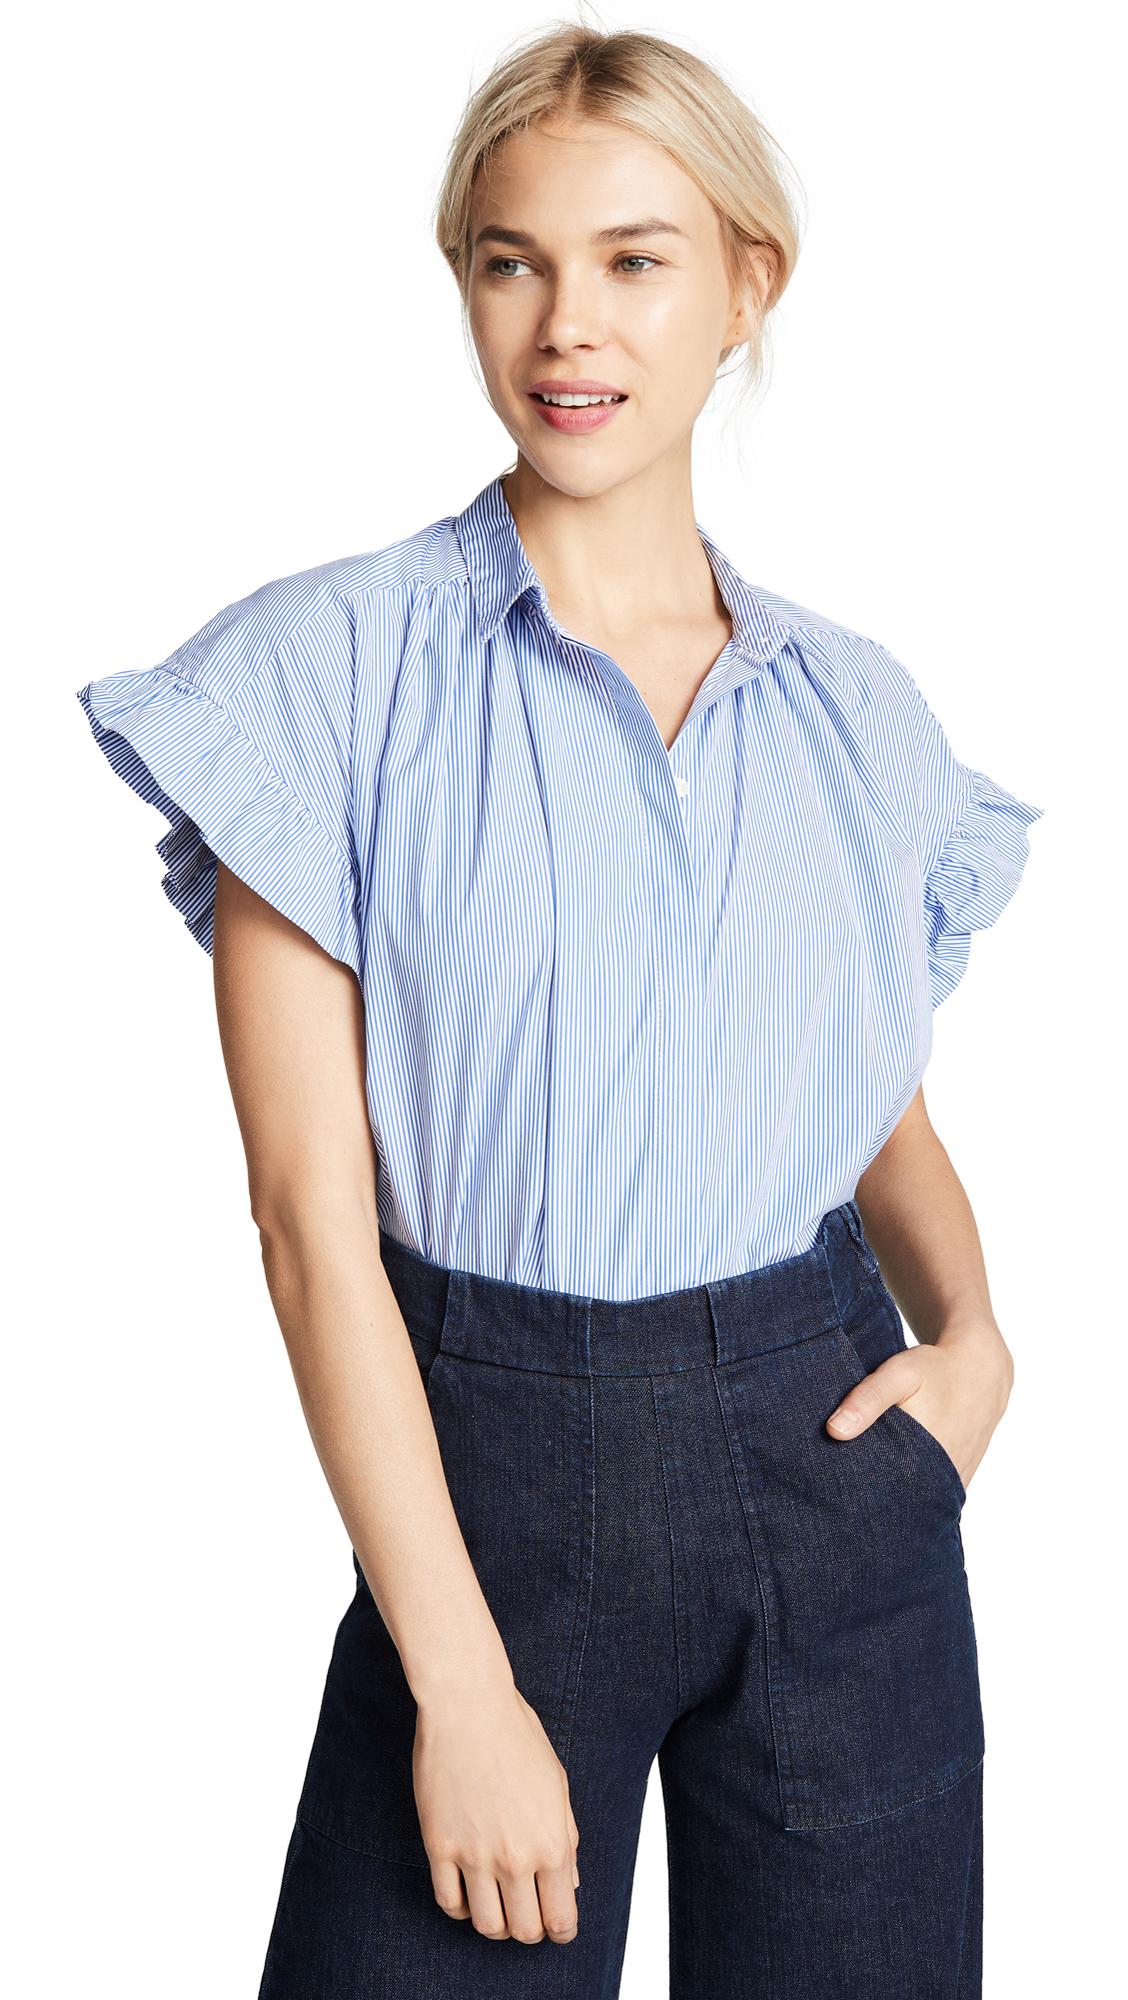 BIRDS OF PARADIS Marianne Ruffle Sleeve Shirt in Blue/White Stripe